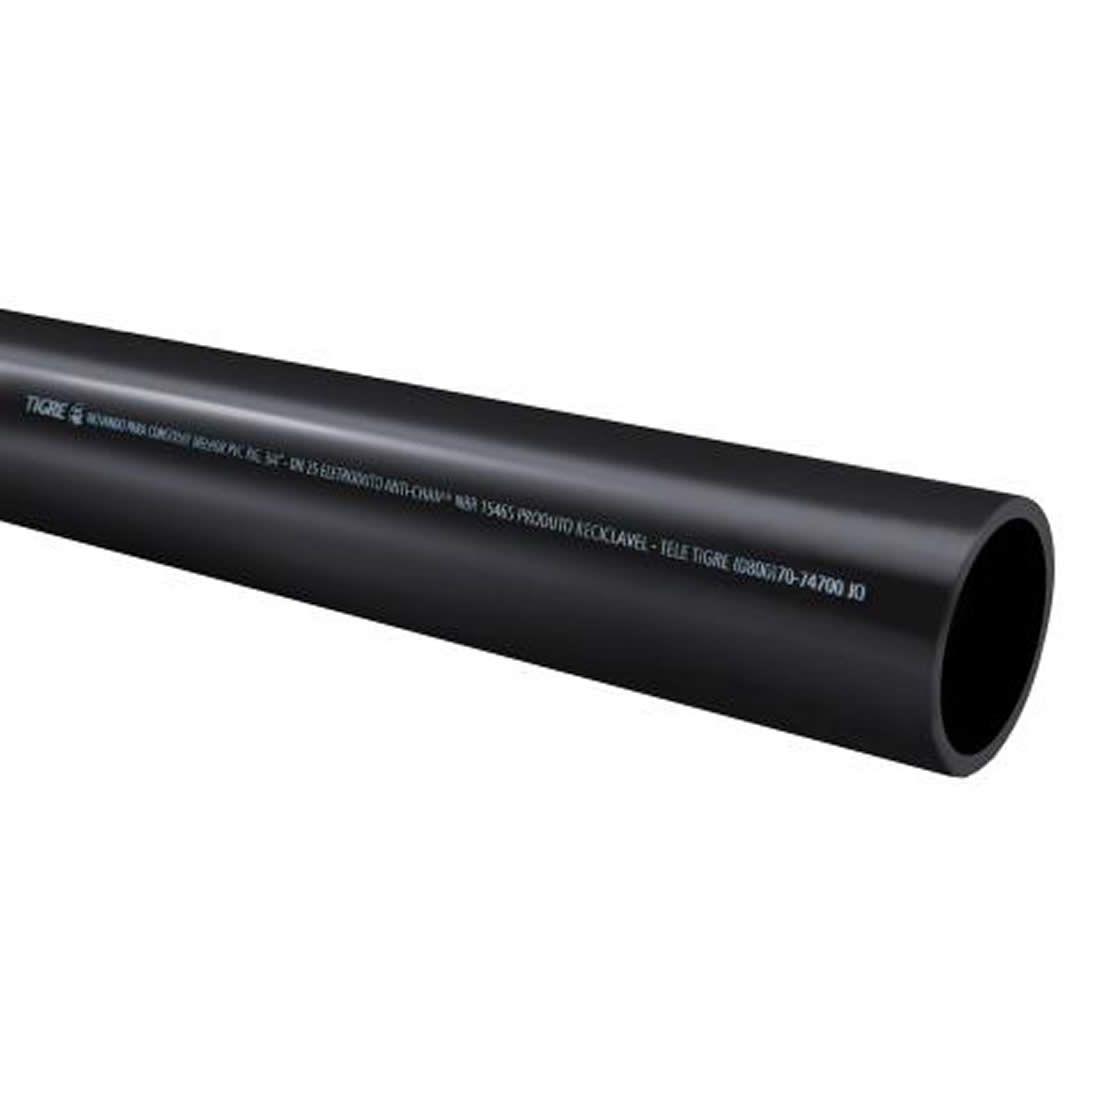 Tubo Eletroduto Soldável Antichama 50mm X 3 Metros Tigre